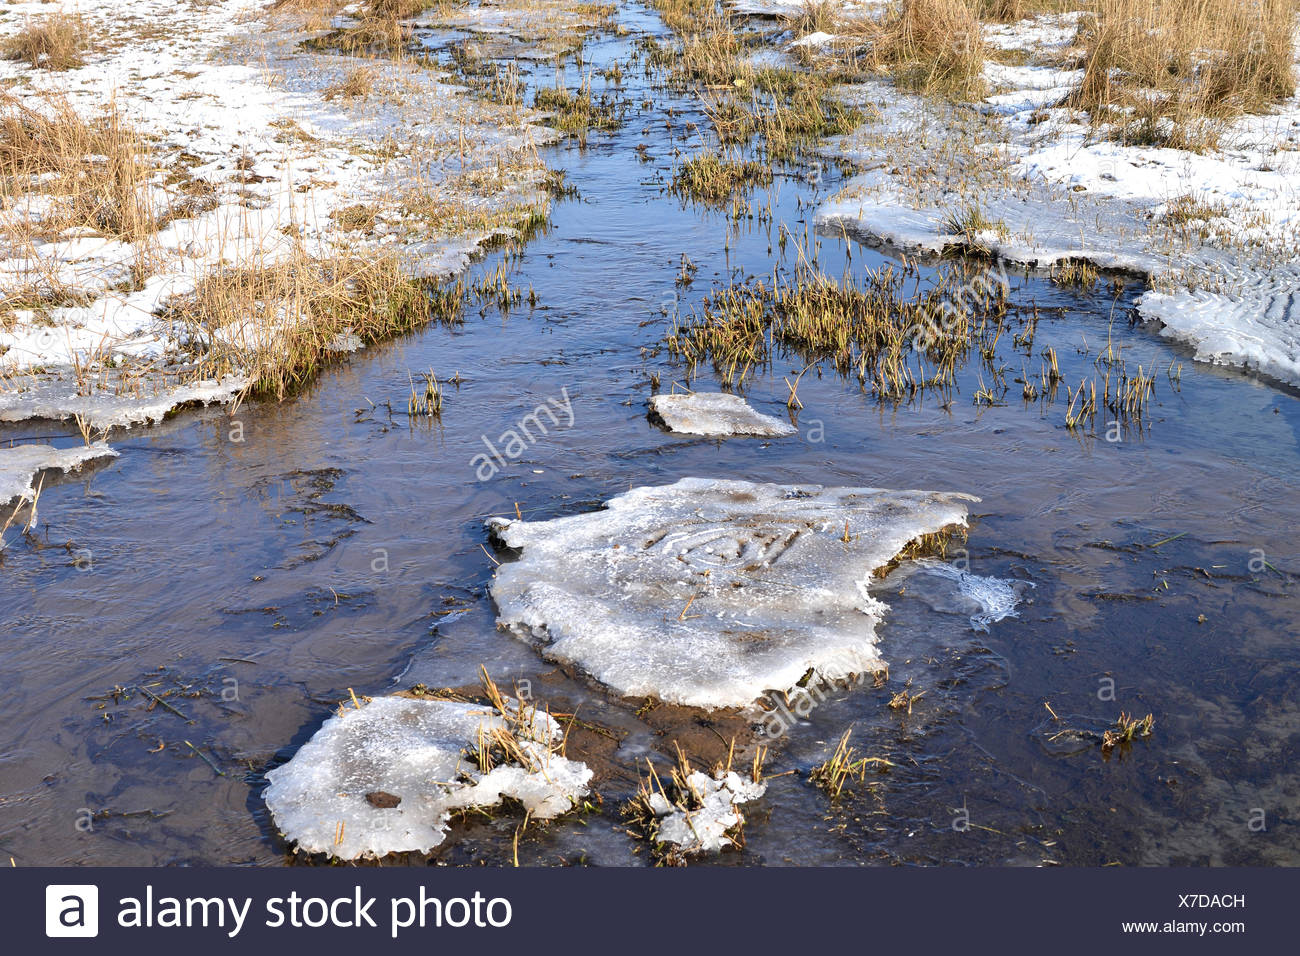 Froze runnel. - Stock Image